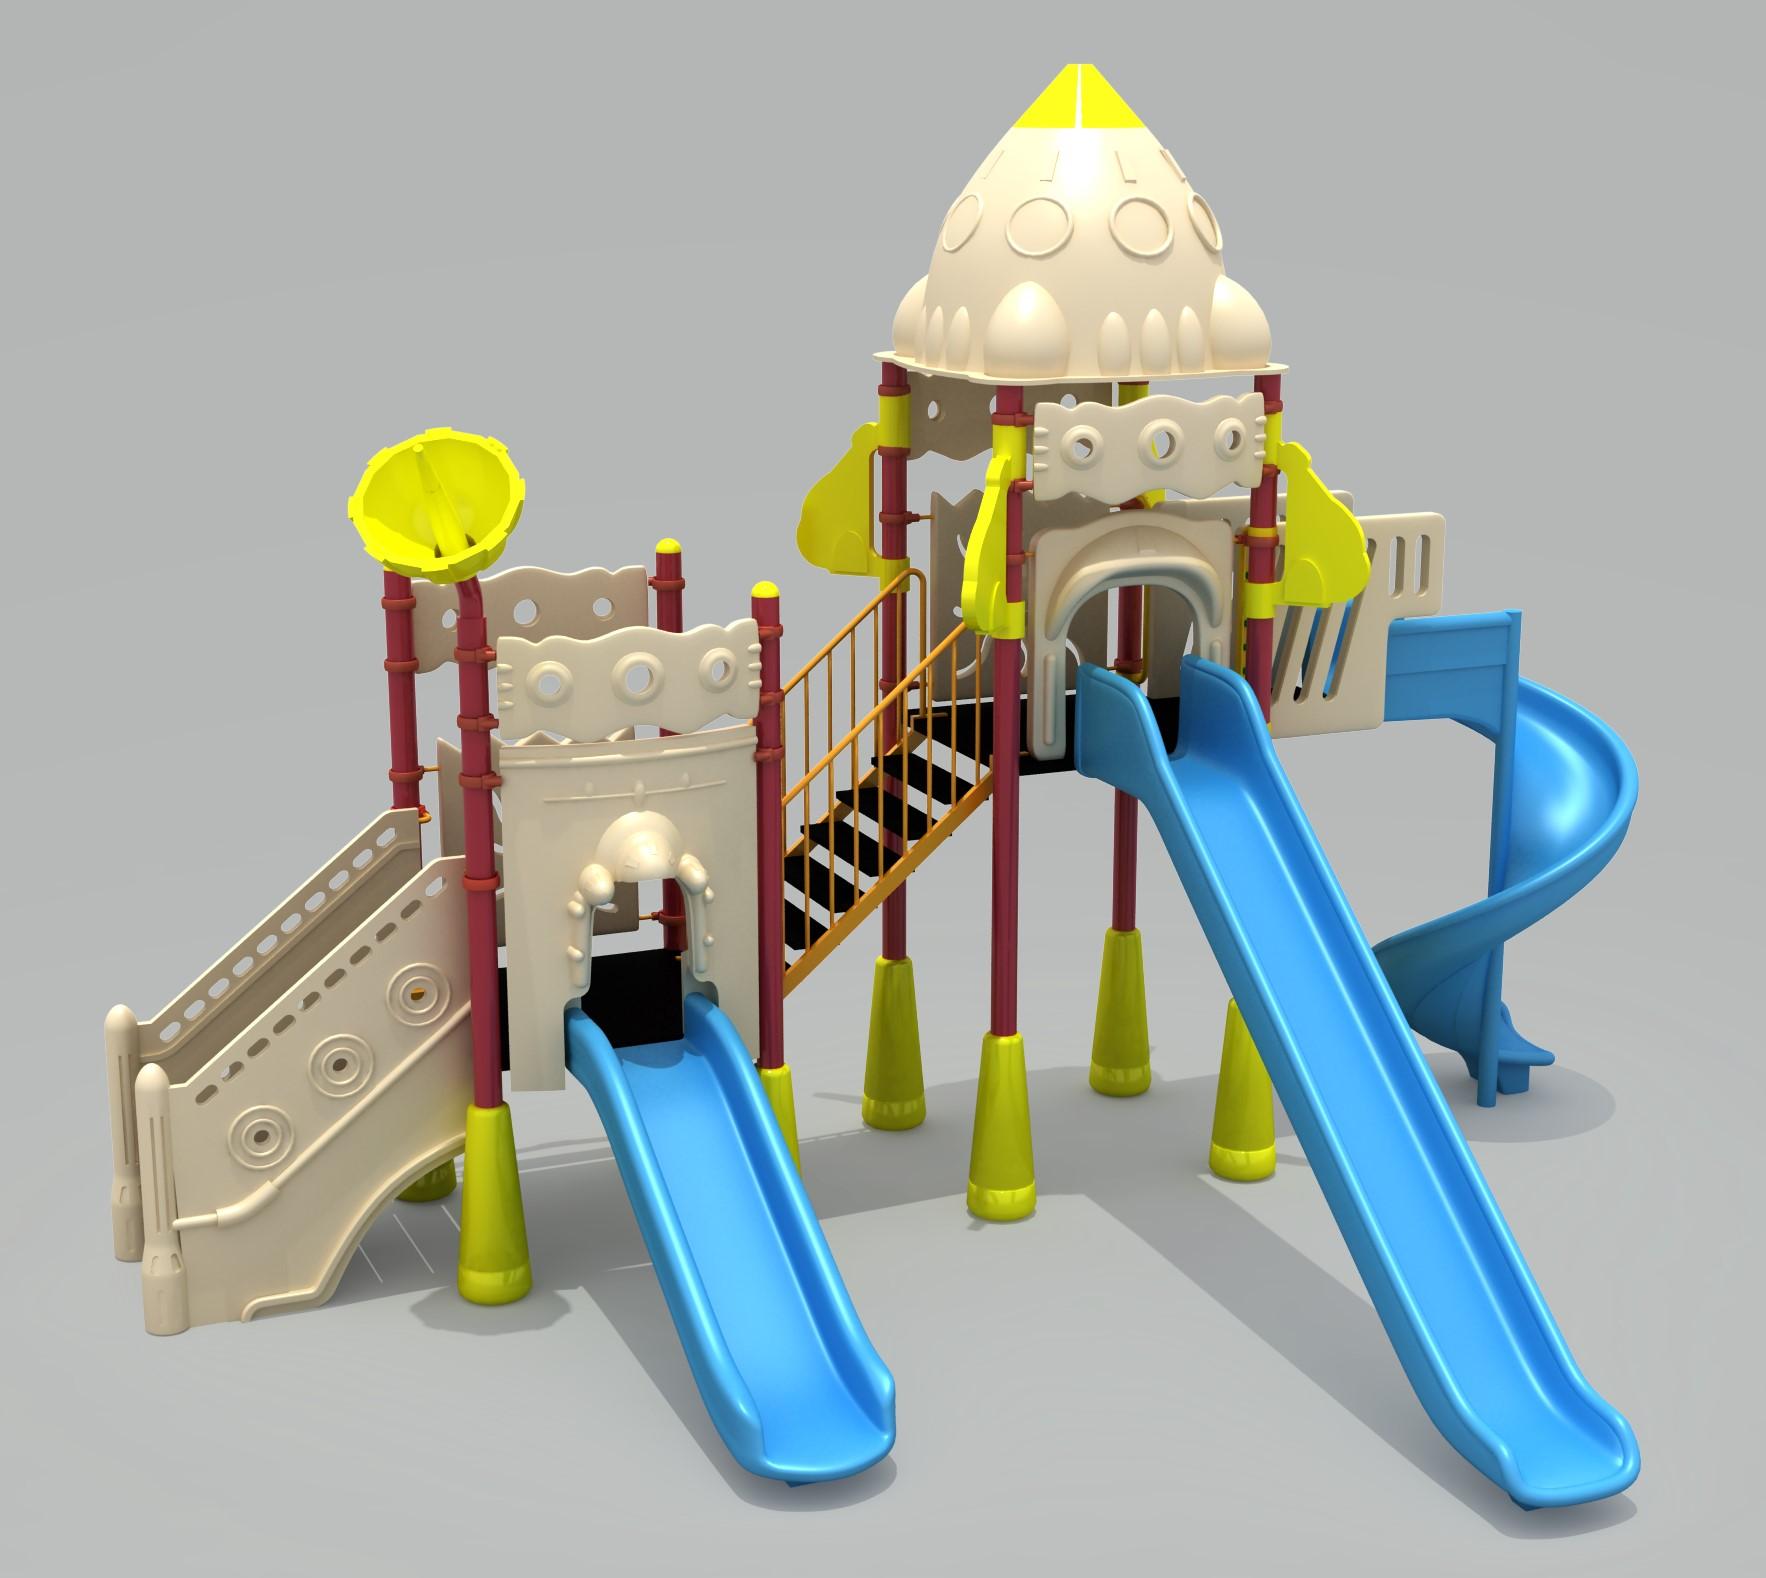 Grup de joaca TEMATICA SPATIU – 2 TURNURI SI 3 TOBOGANE